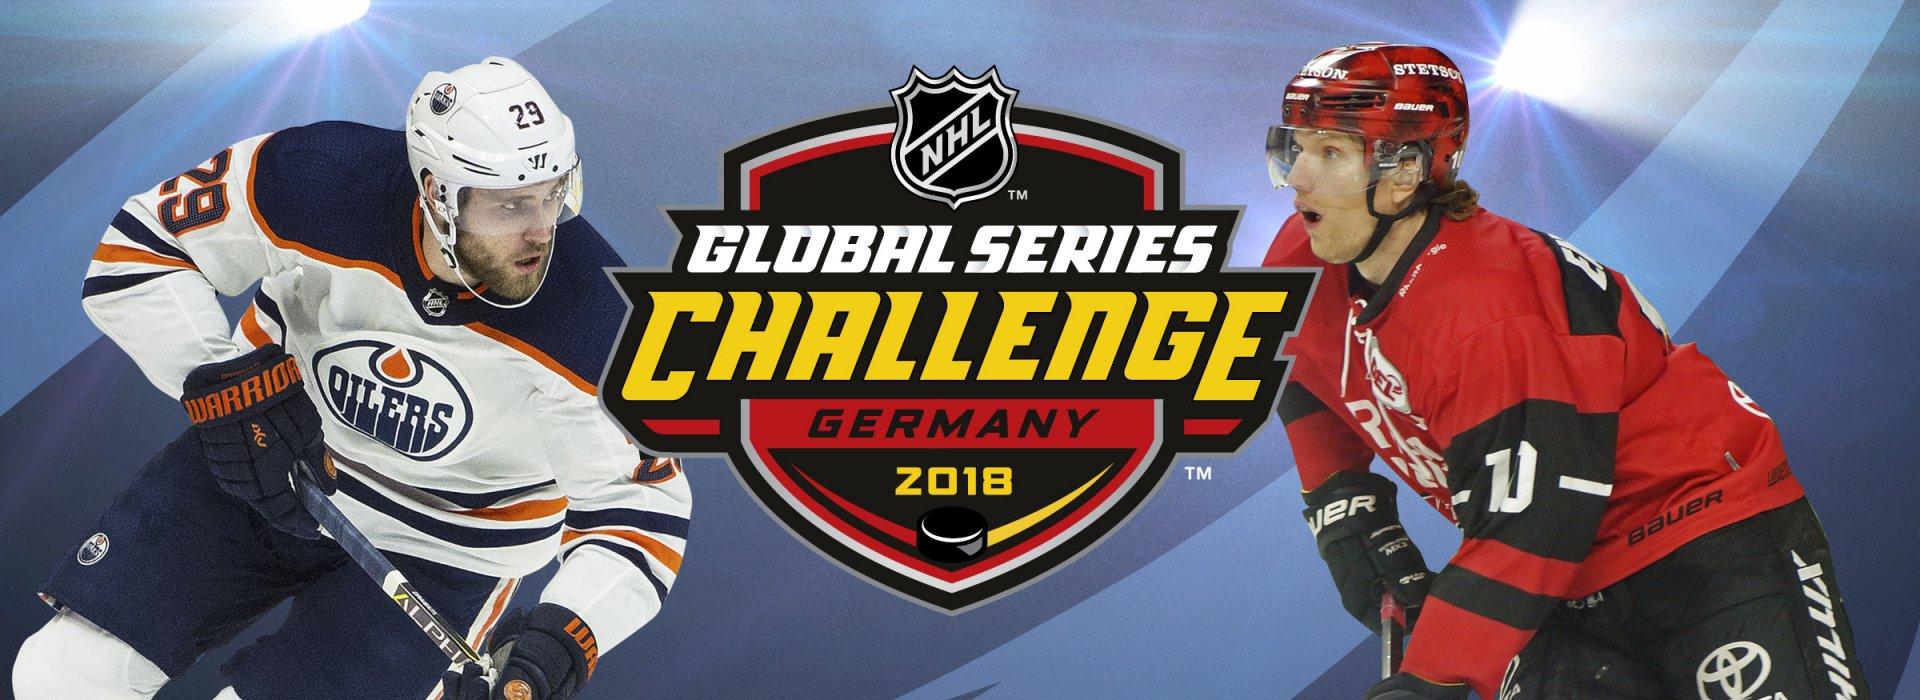 Oilers Preseason Gameday - @ Cologne